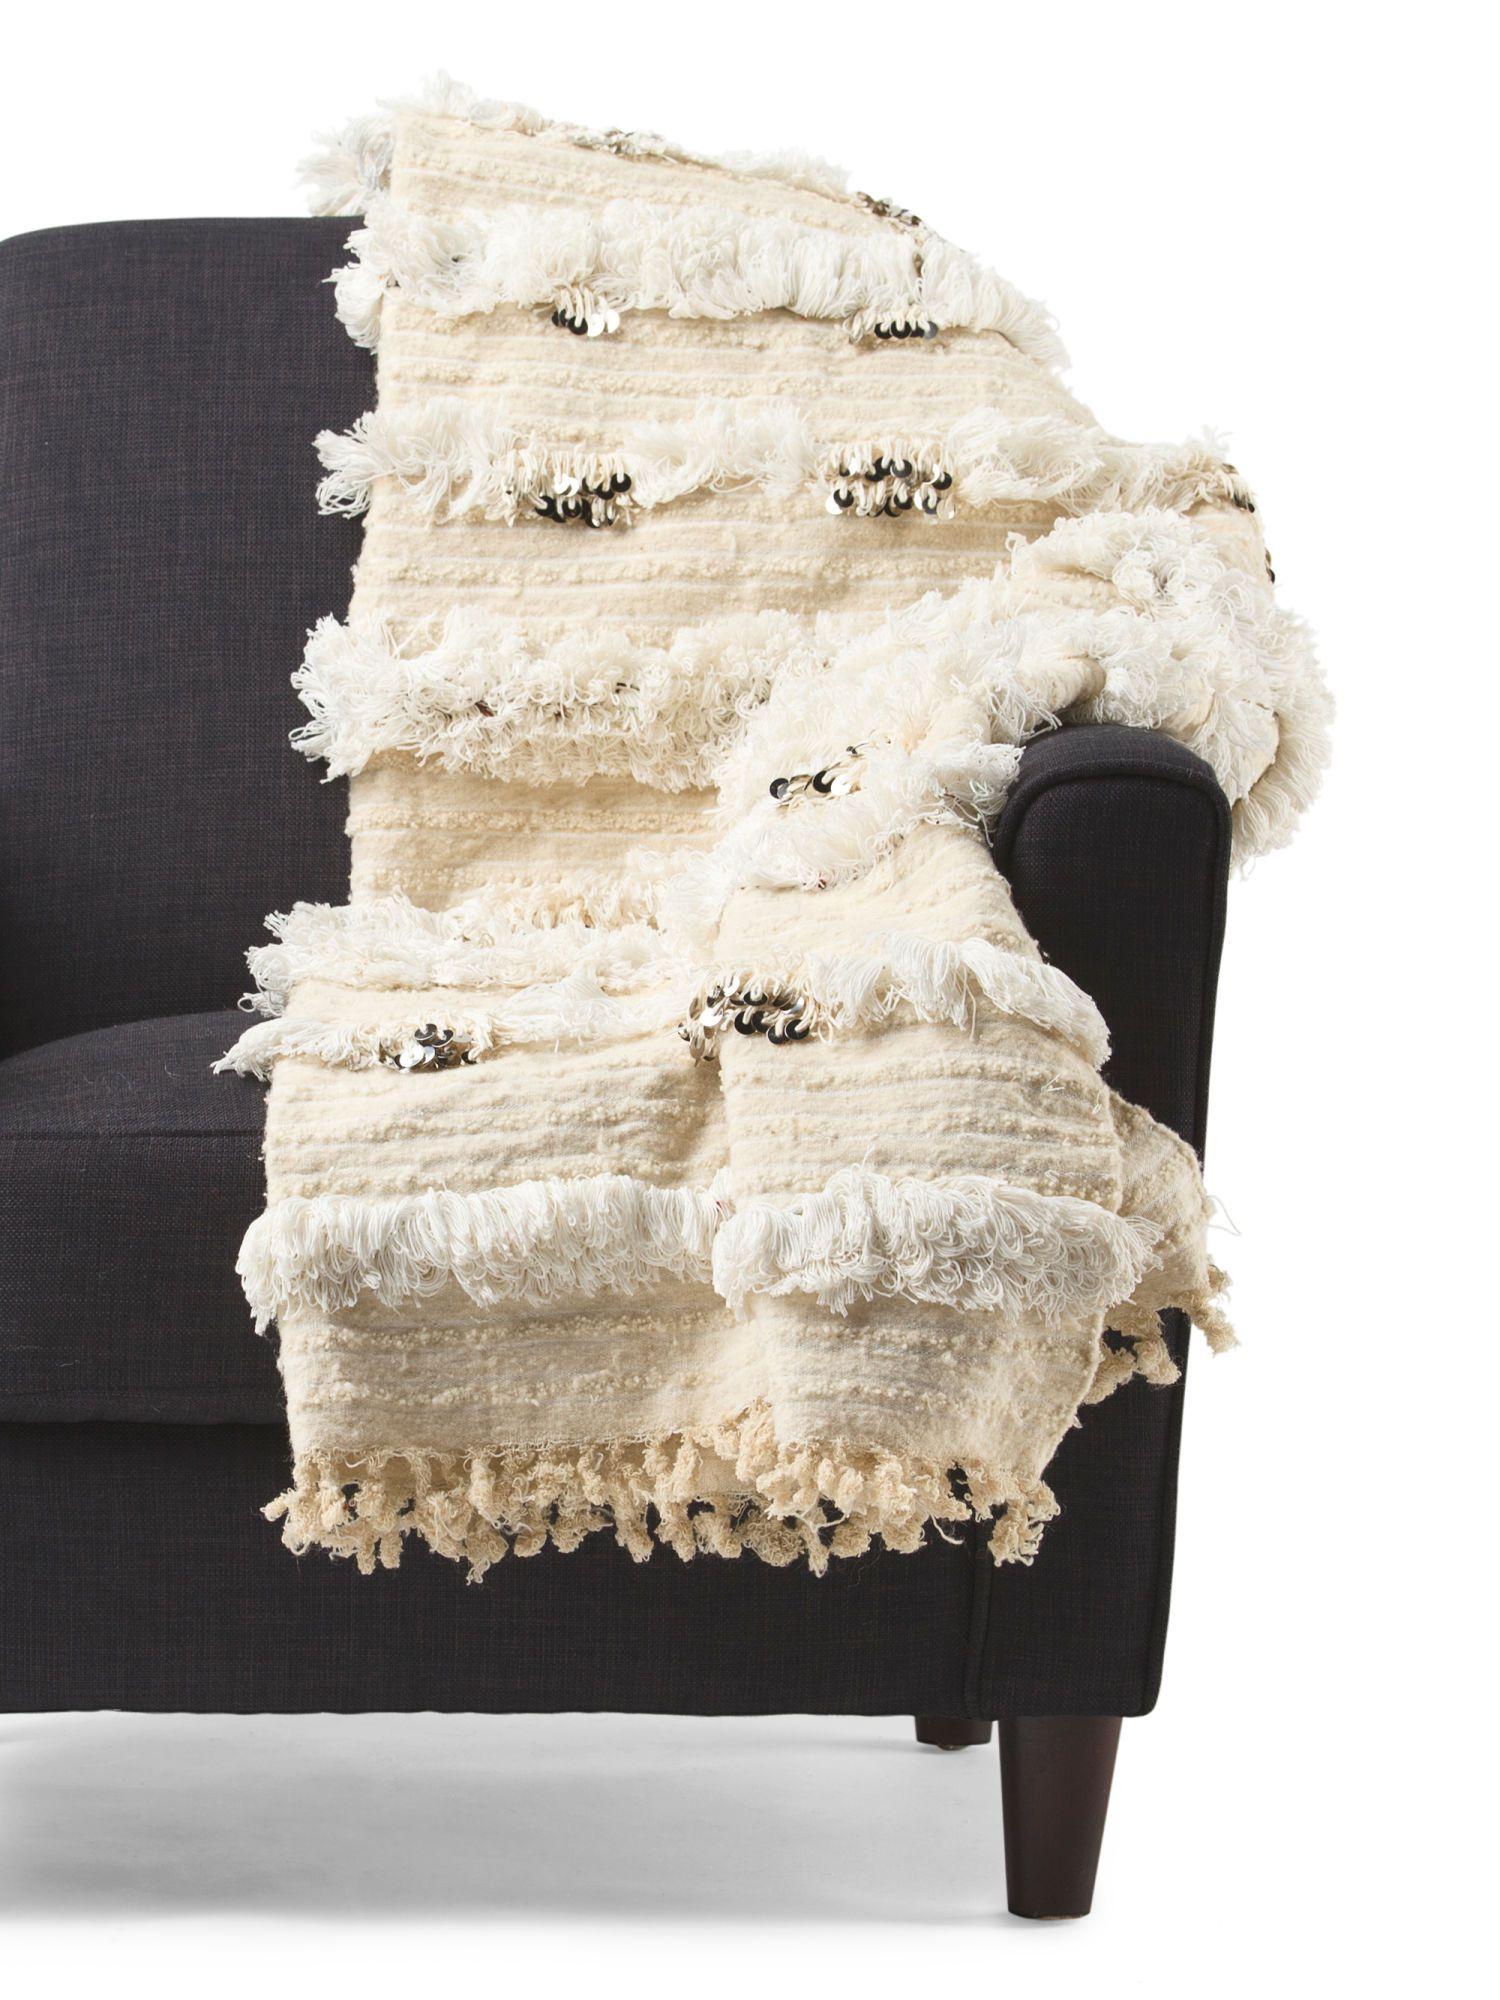 Tj Maxx Wedding.Made In Morocco Authentic Wedding Blanket Throws T J Maxx